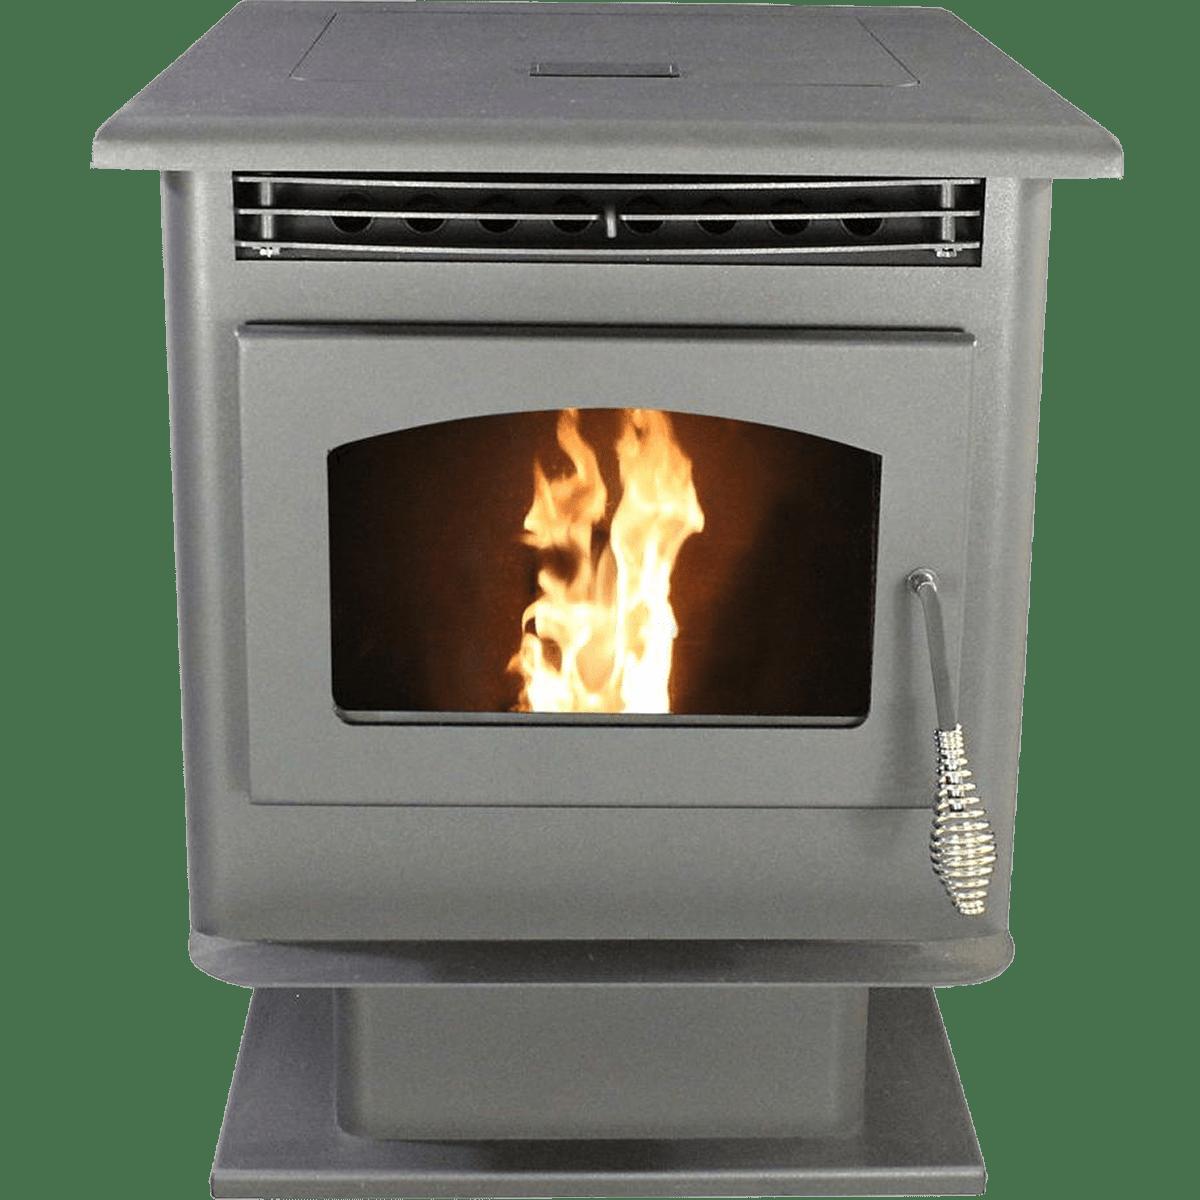 us stove 5040 pellet stove free shipping sylvane. Black Bedroom Furniture Sets. Home Design Ideas